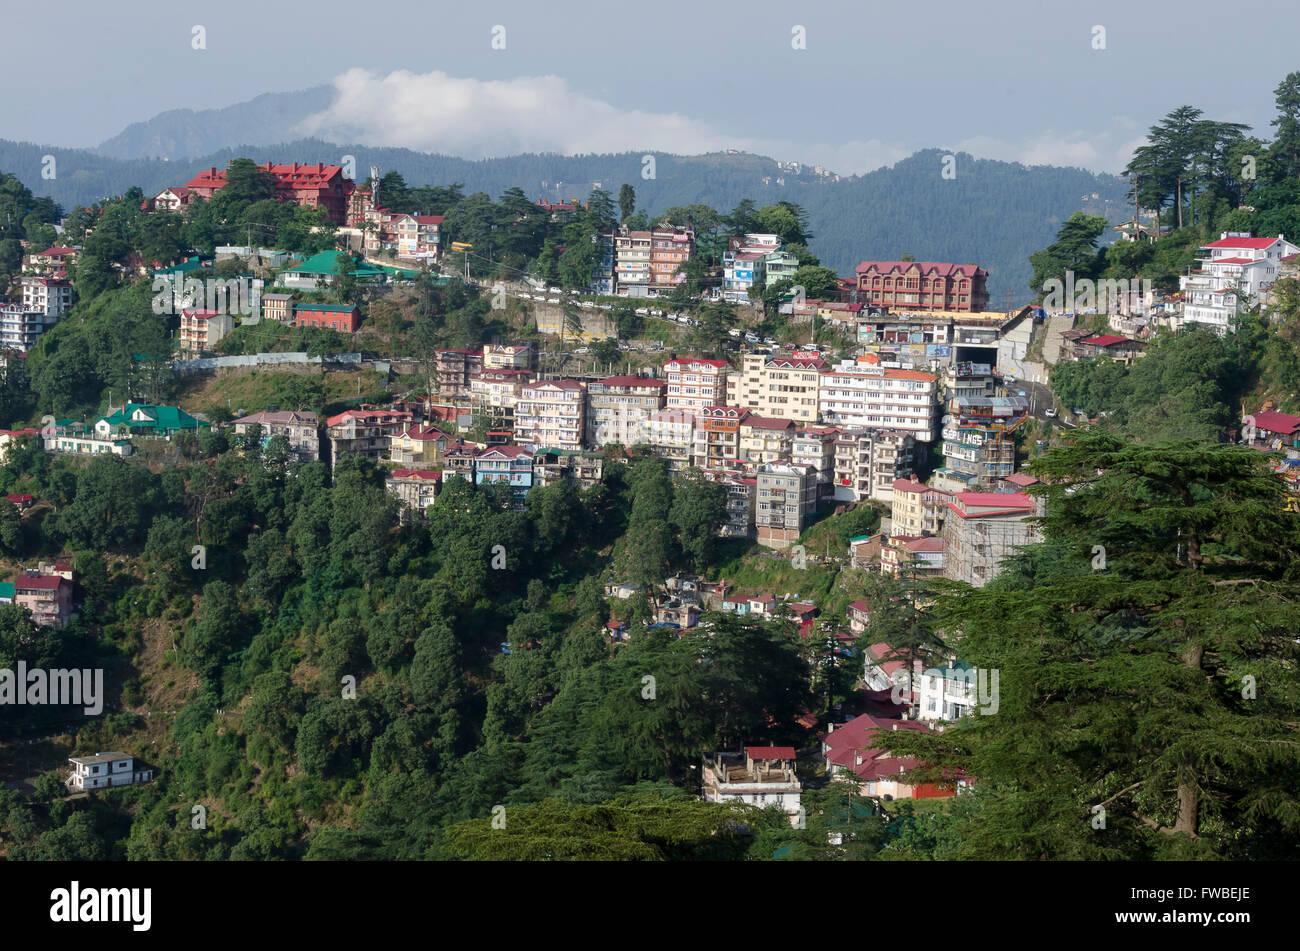 Houses on hillside, Shimla, Himachal Pradesh, India. - Stock Image